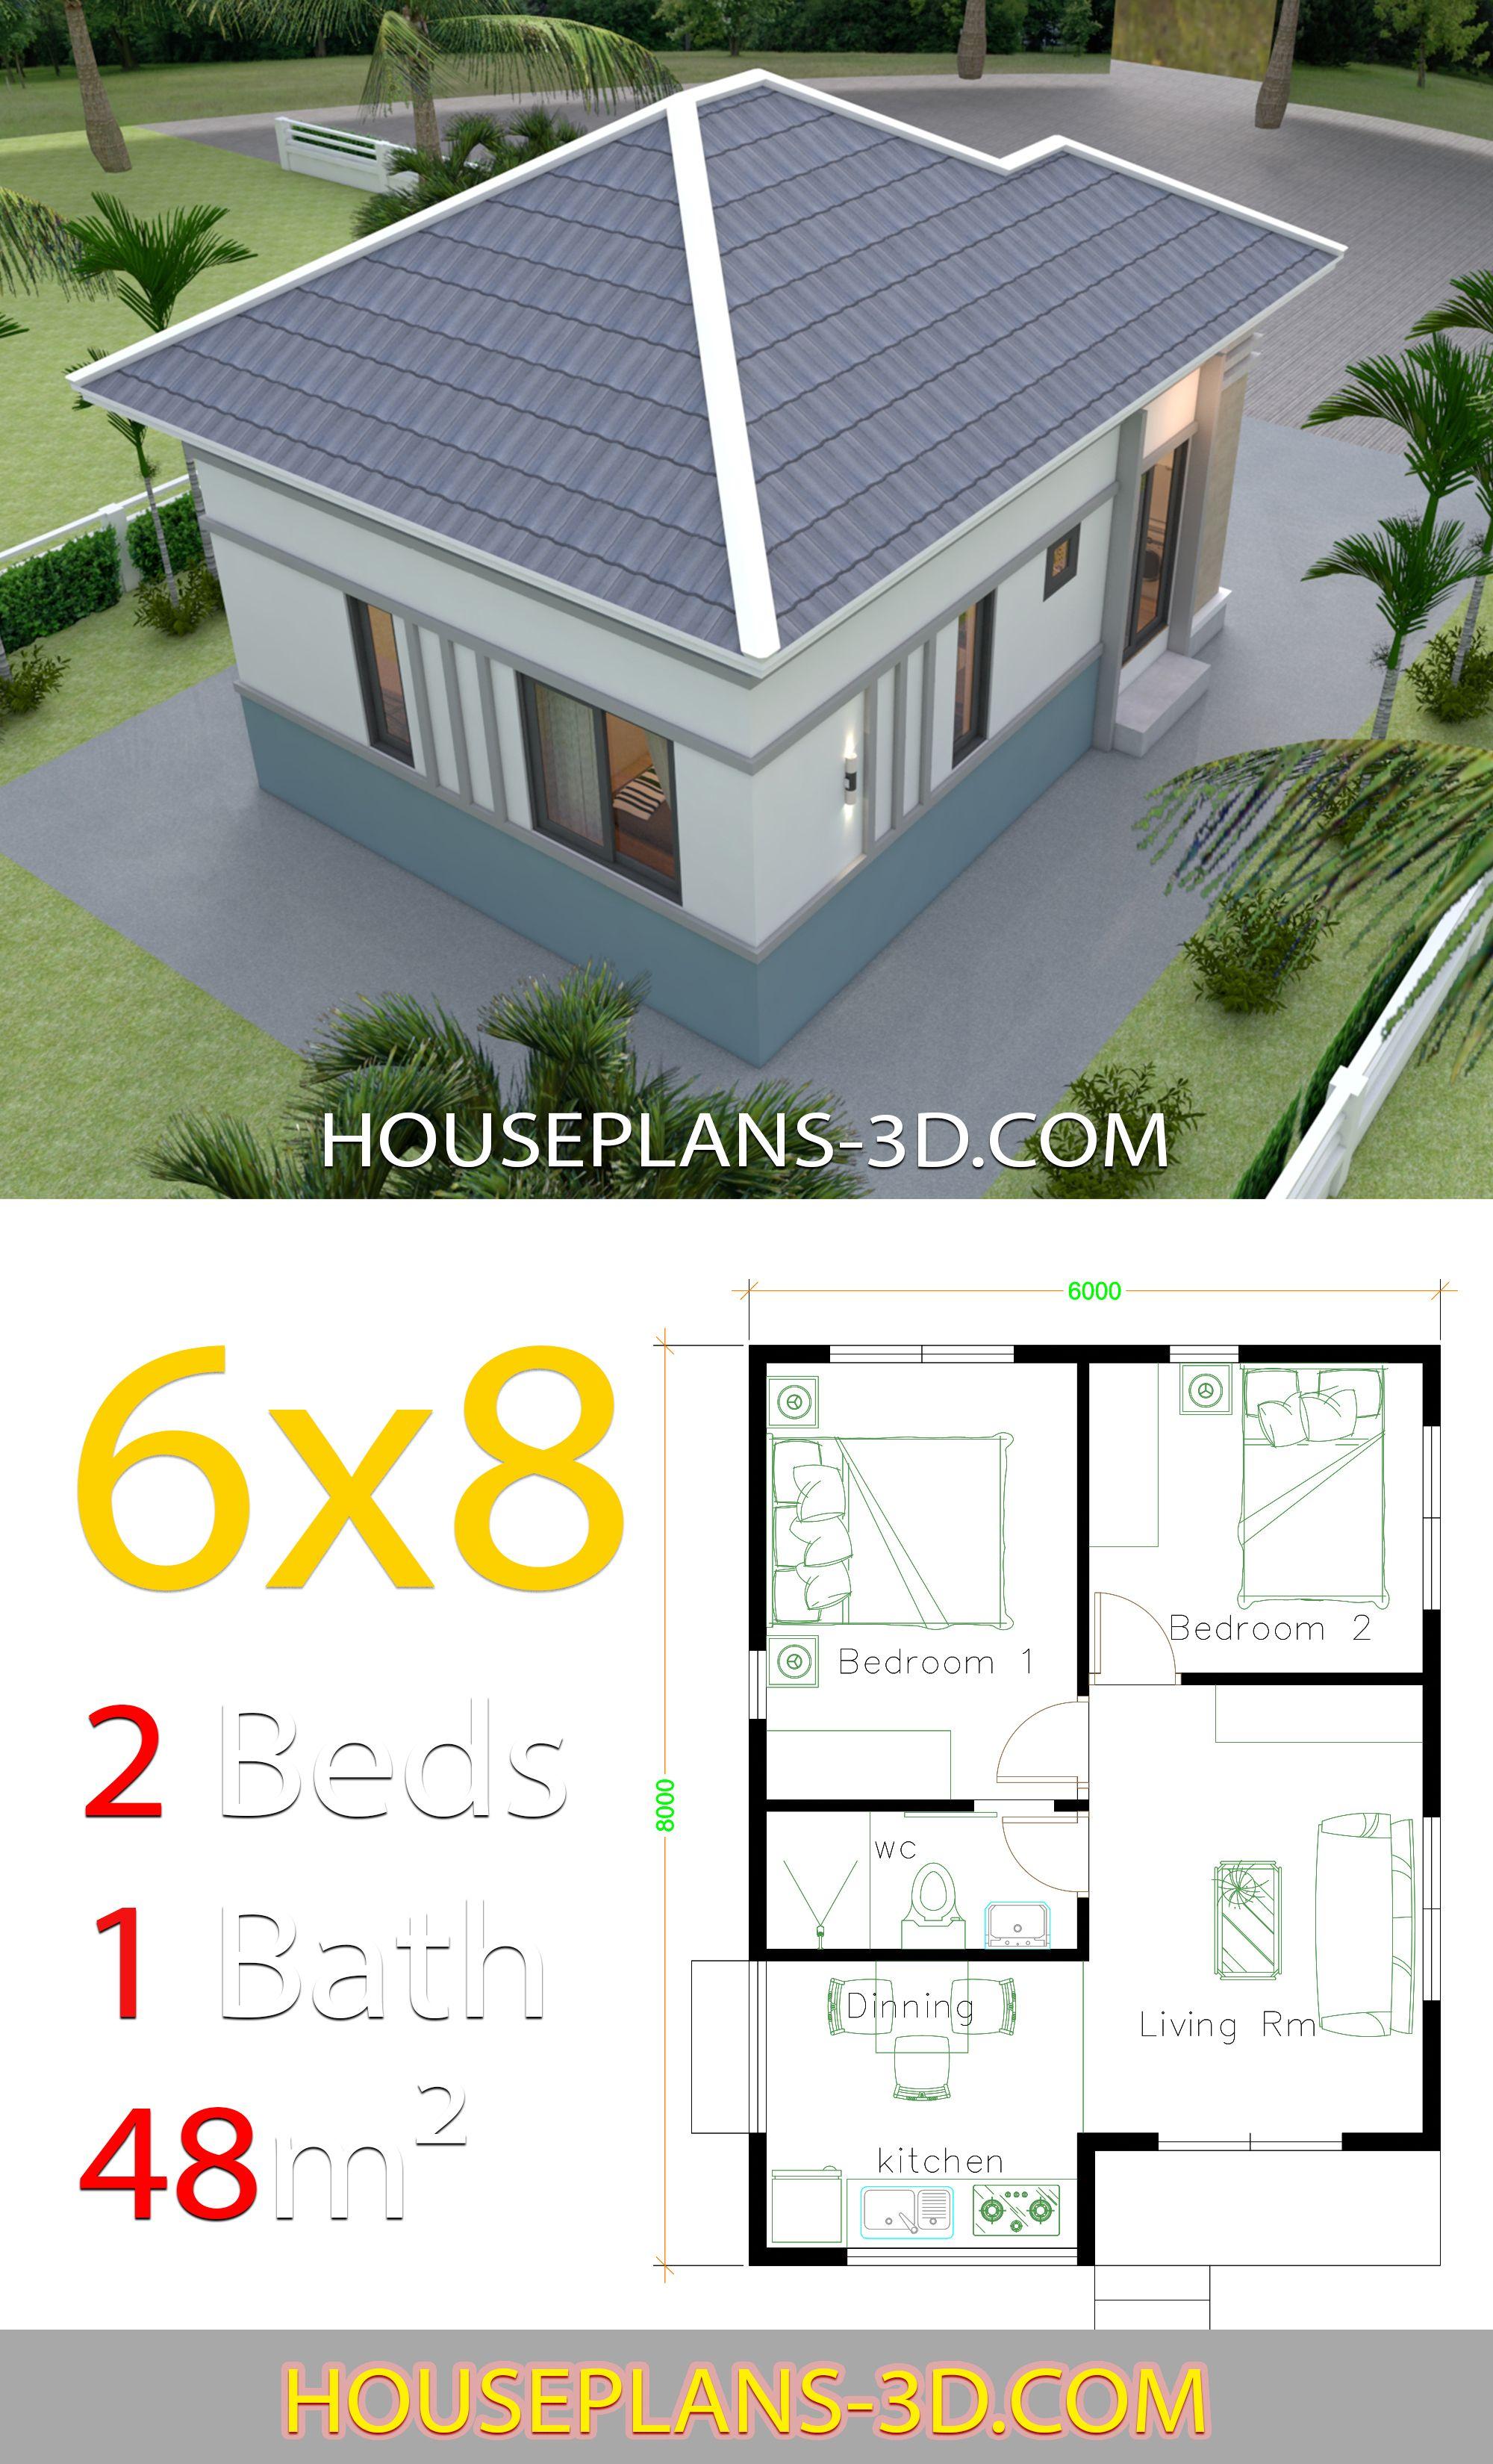 House Design 6x8 With 2 Bedrooms Hip Roof House Plans 3d Projetos De Casas Pequenas Faxadas De Casas Projetos De Casas Simples